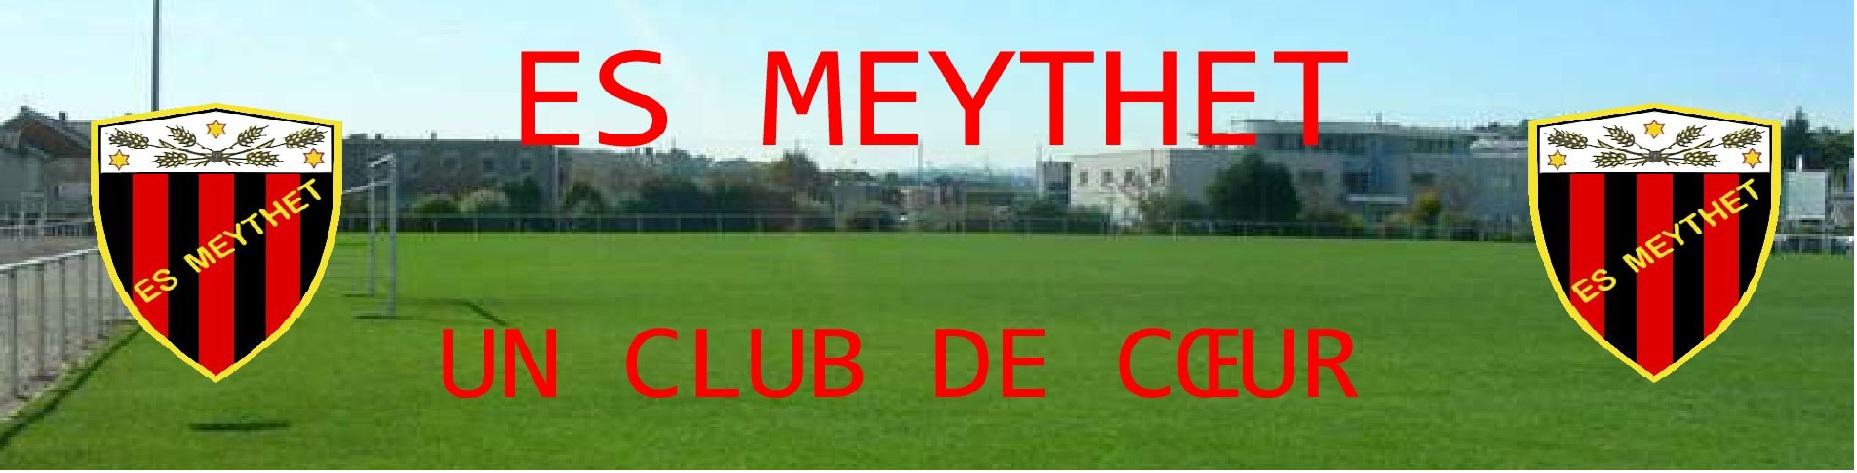 Etoile Sportive de Meythet : site officiel du club de foot de MEYTHET - footeo